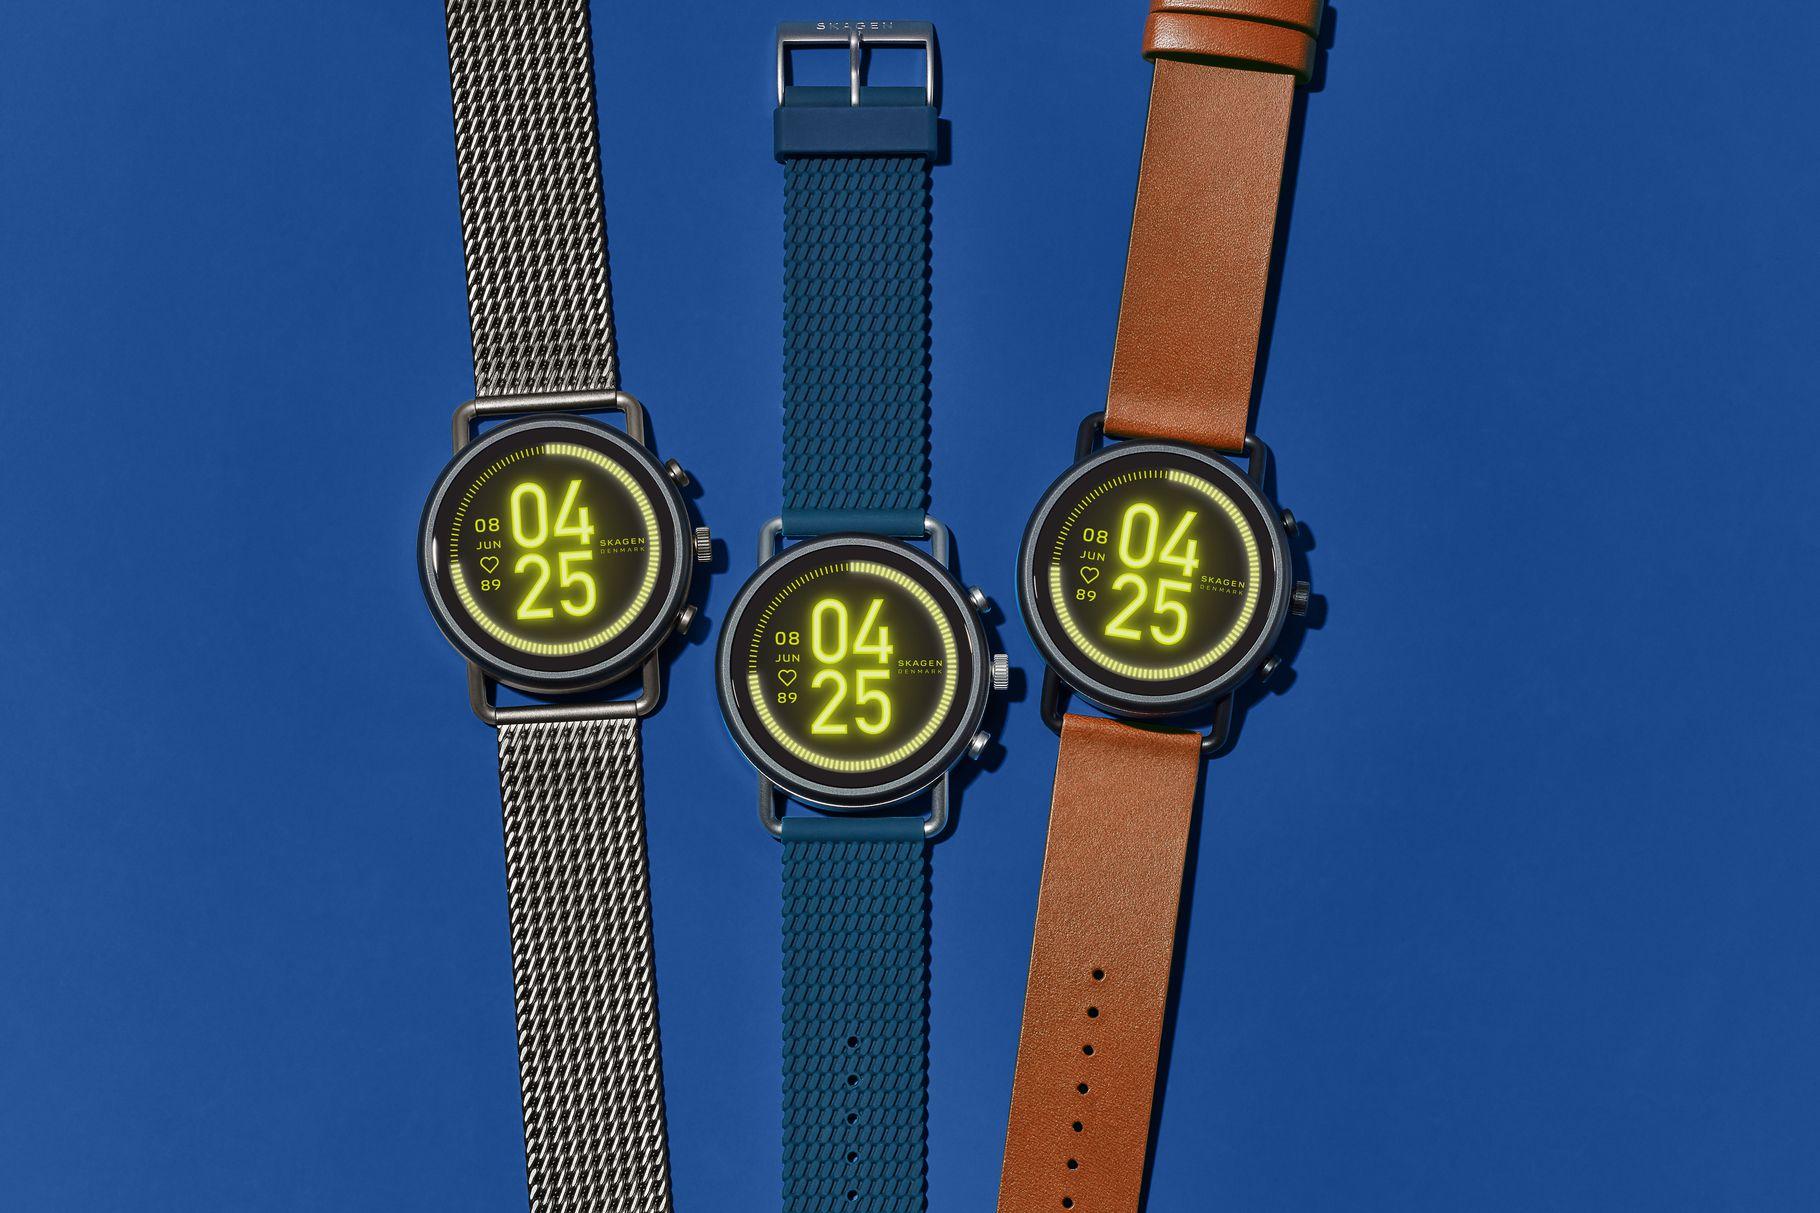 Skagen Falster 3 hodinky s Wear OS, 1 GB RAM a novými funkcemi [CES]